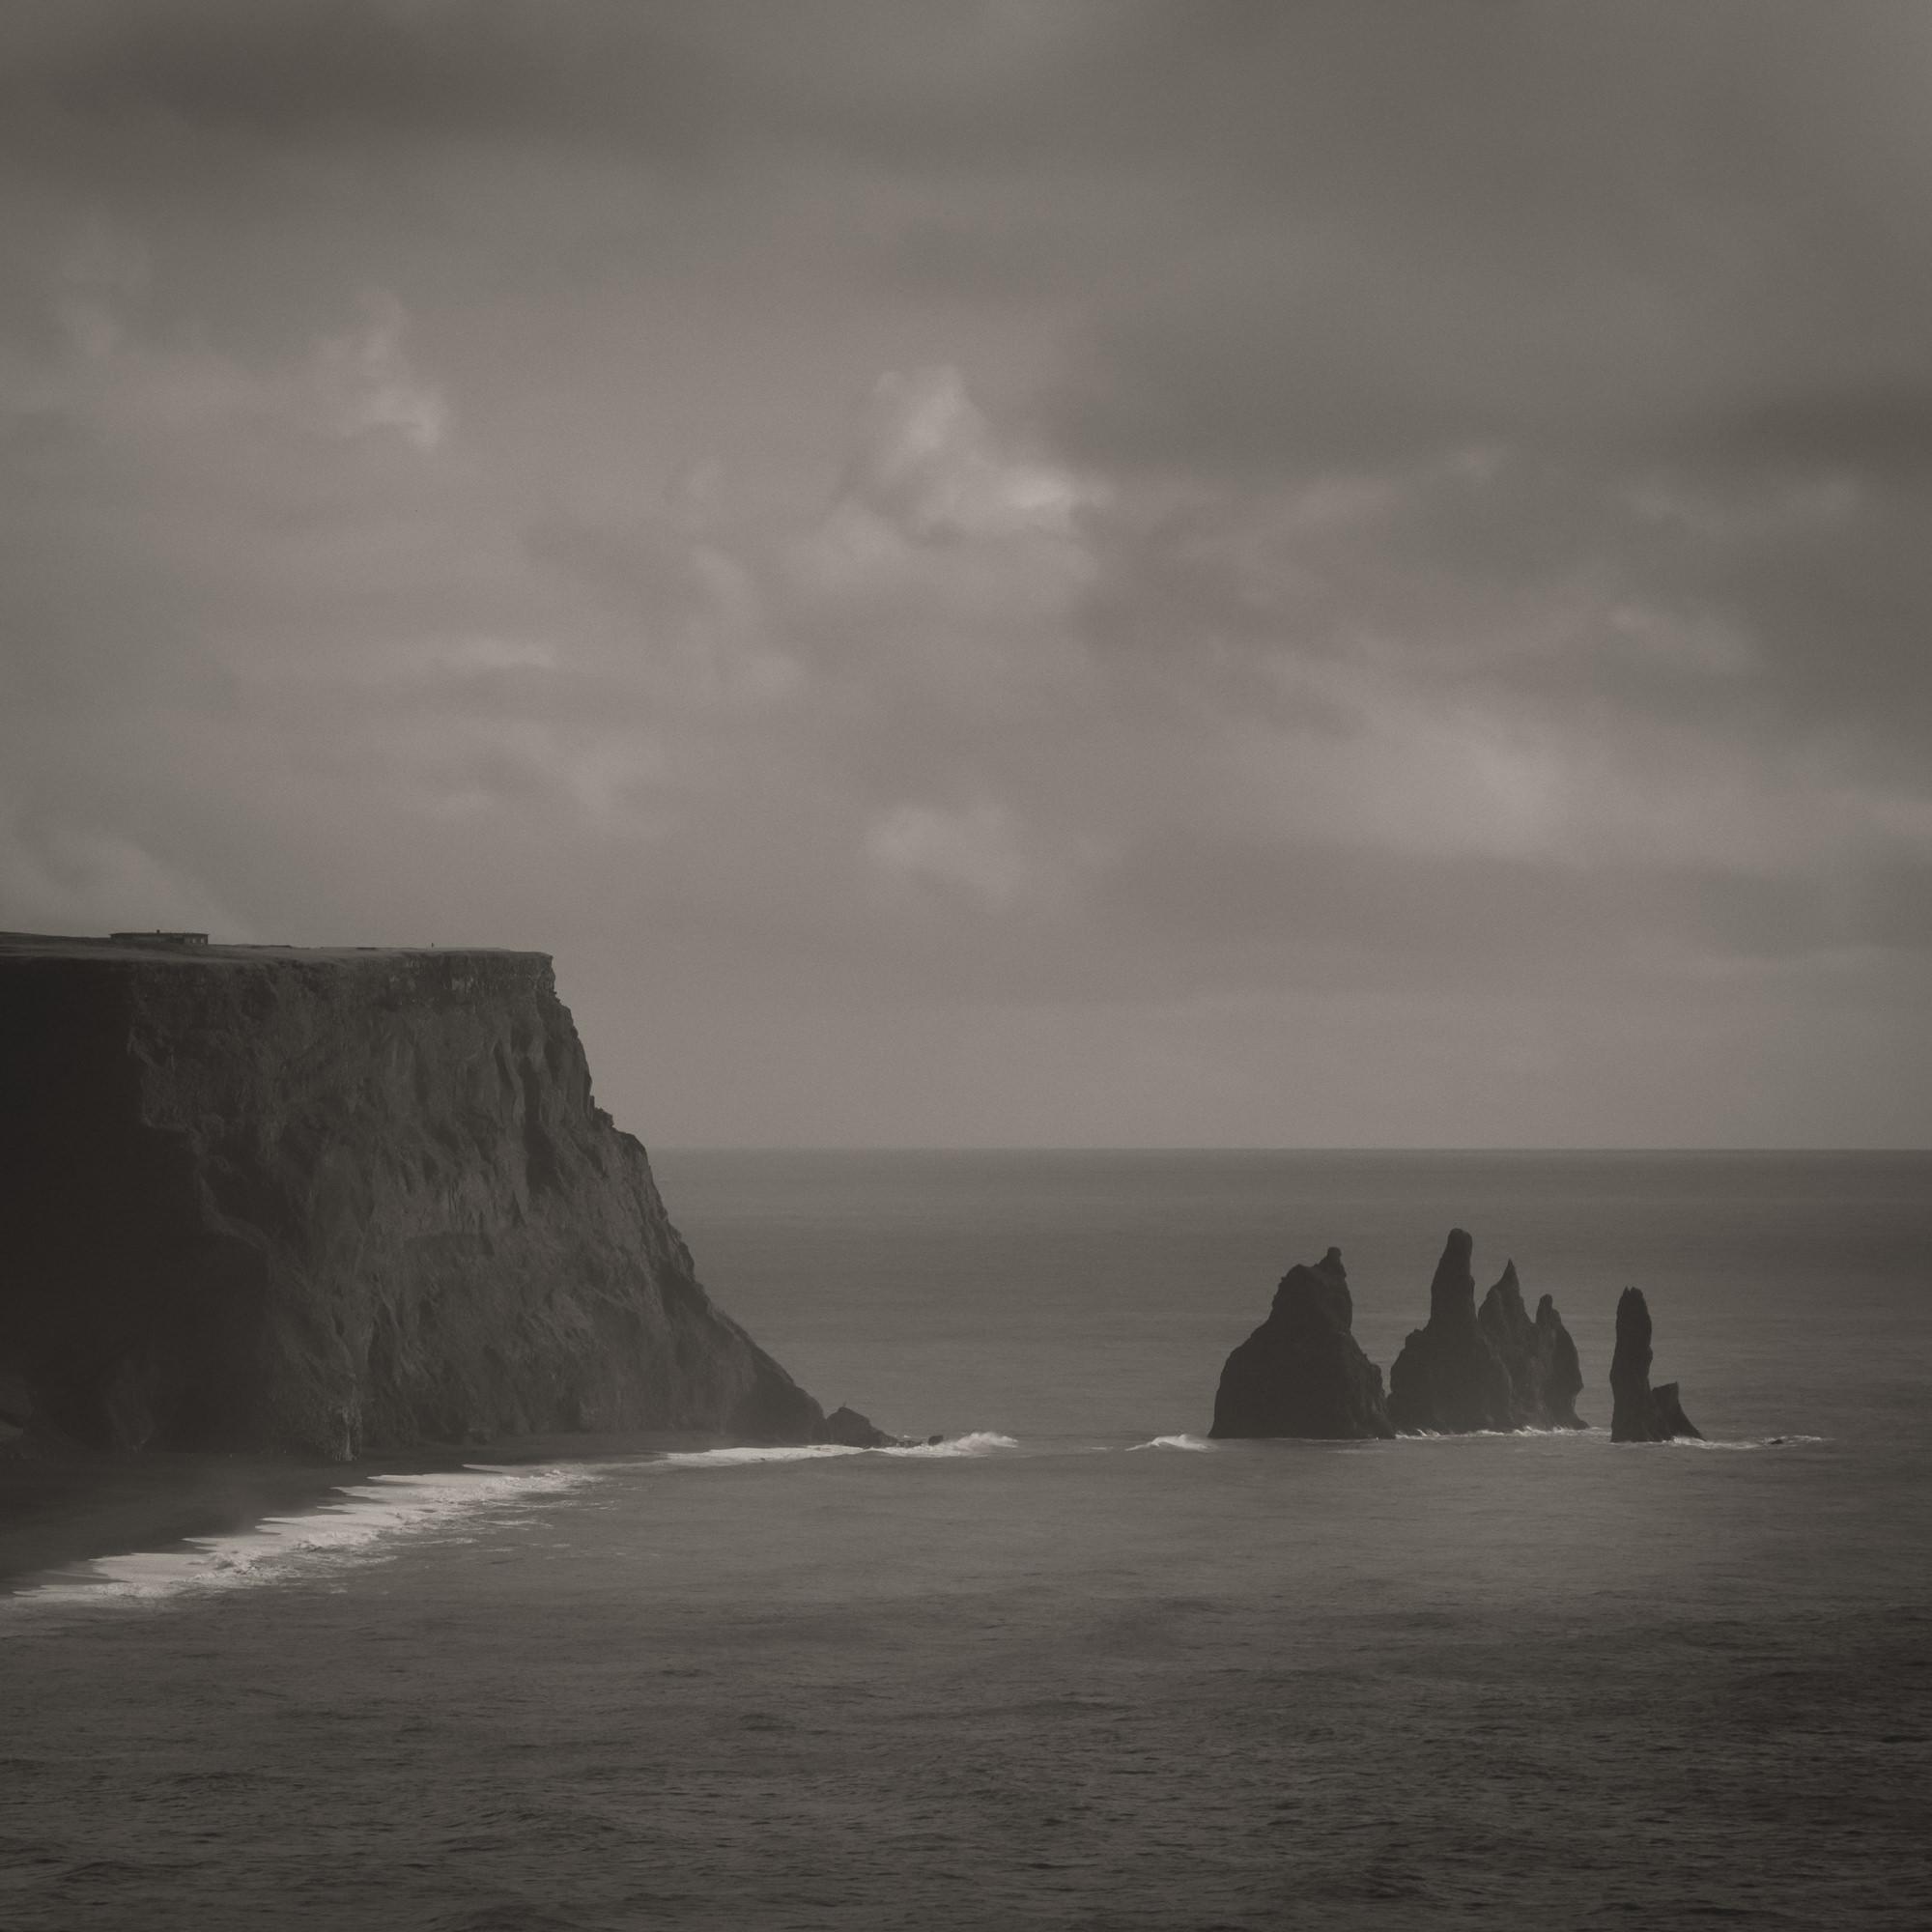 Atlantic Ocean, Vik, Iceland.  ISO 100, 170mm, f8, 1/800 sec